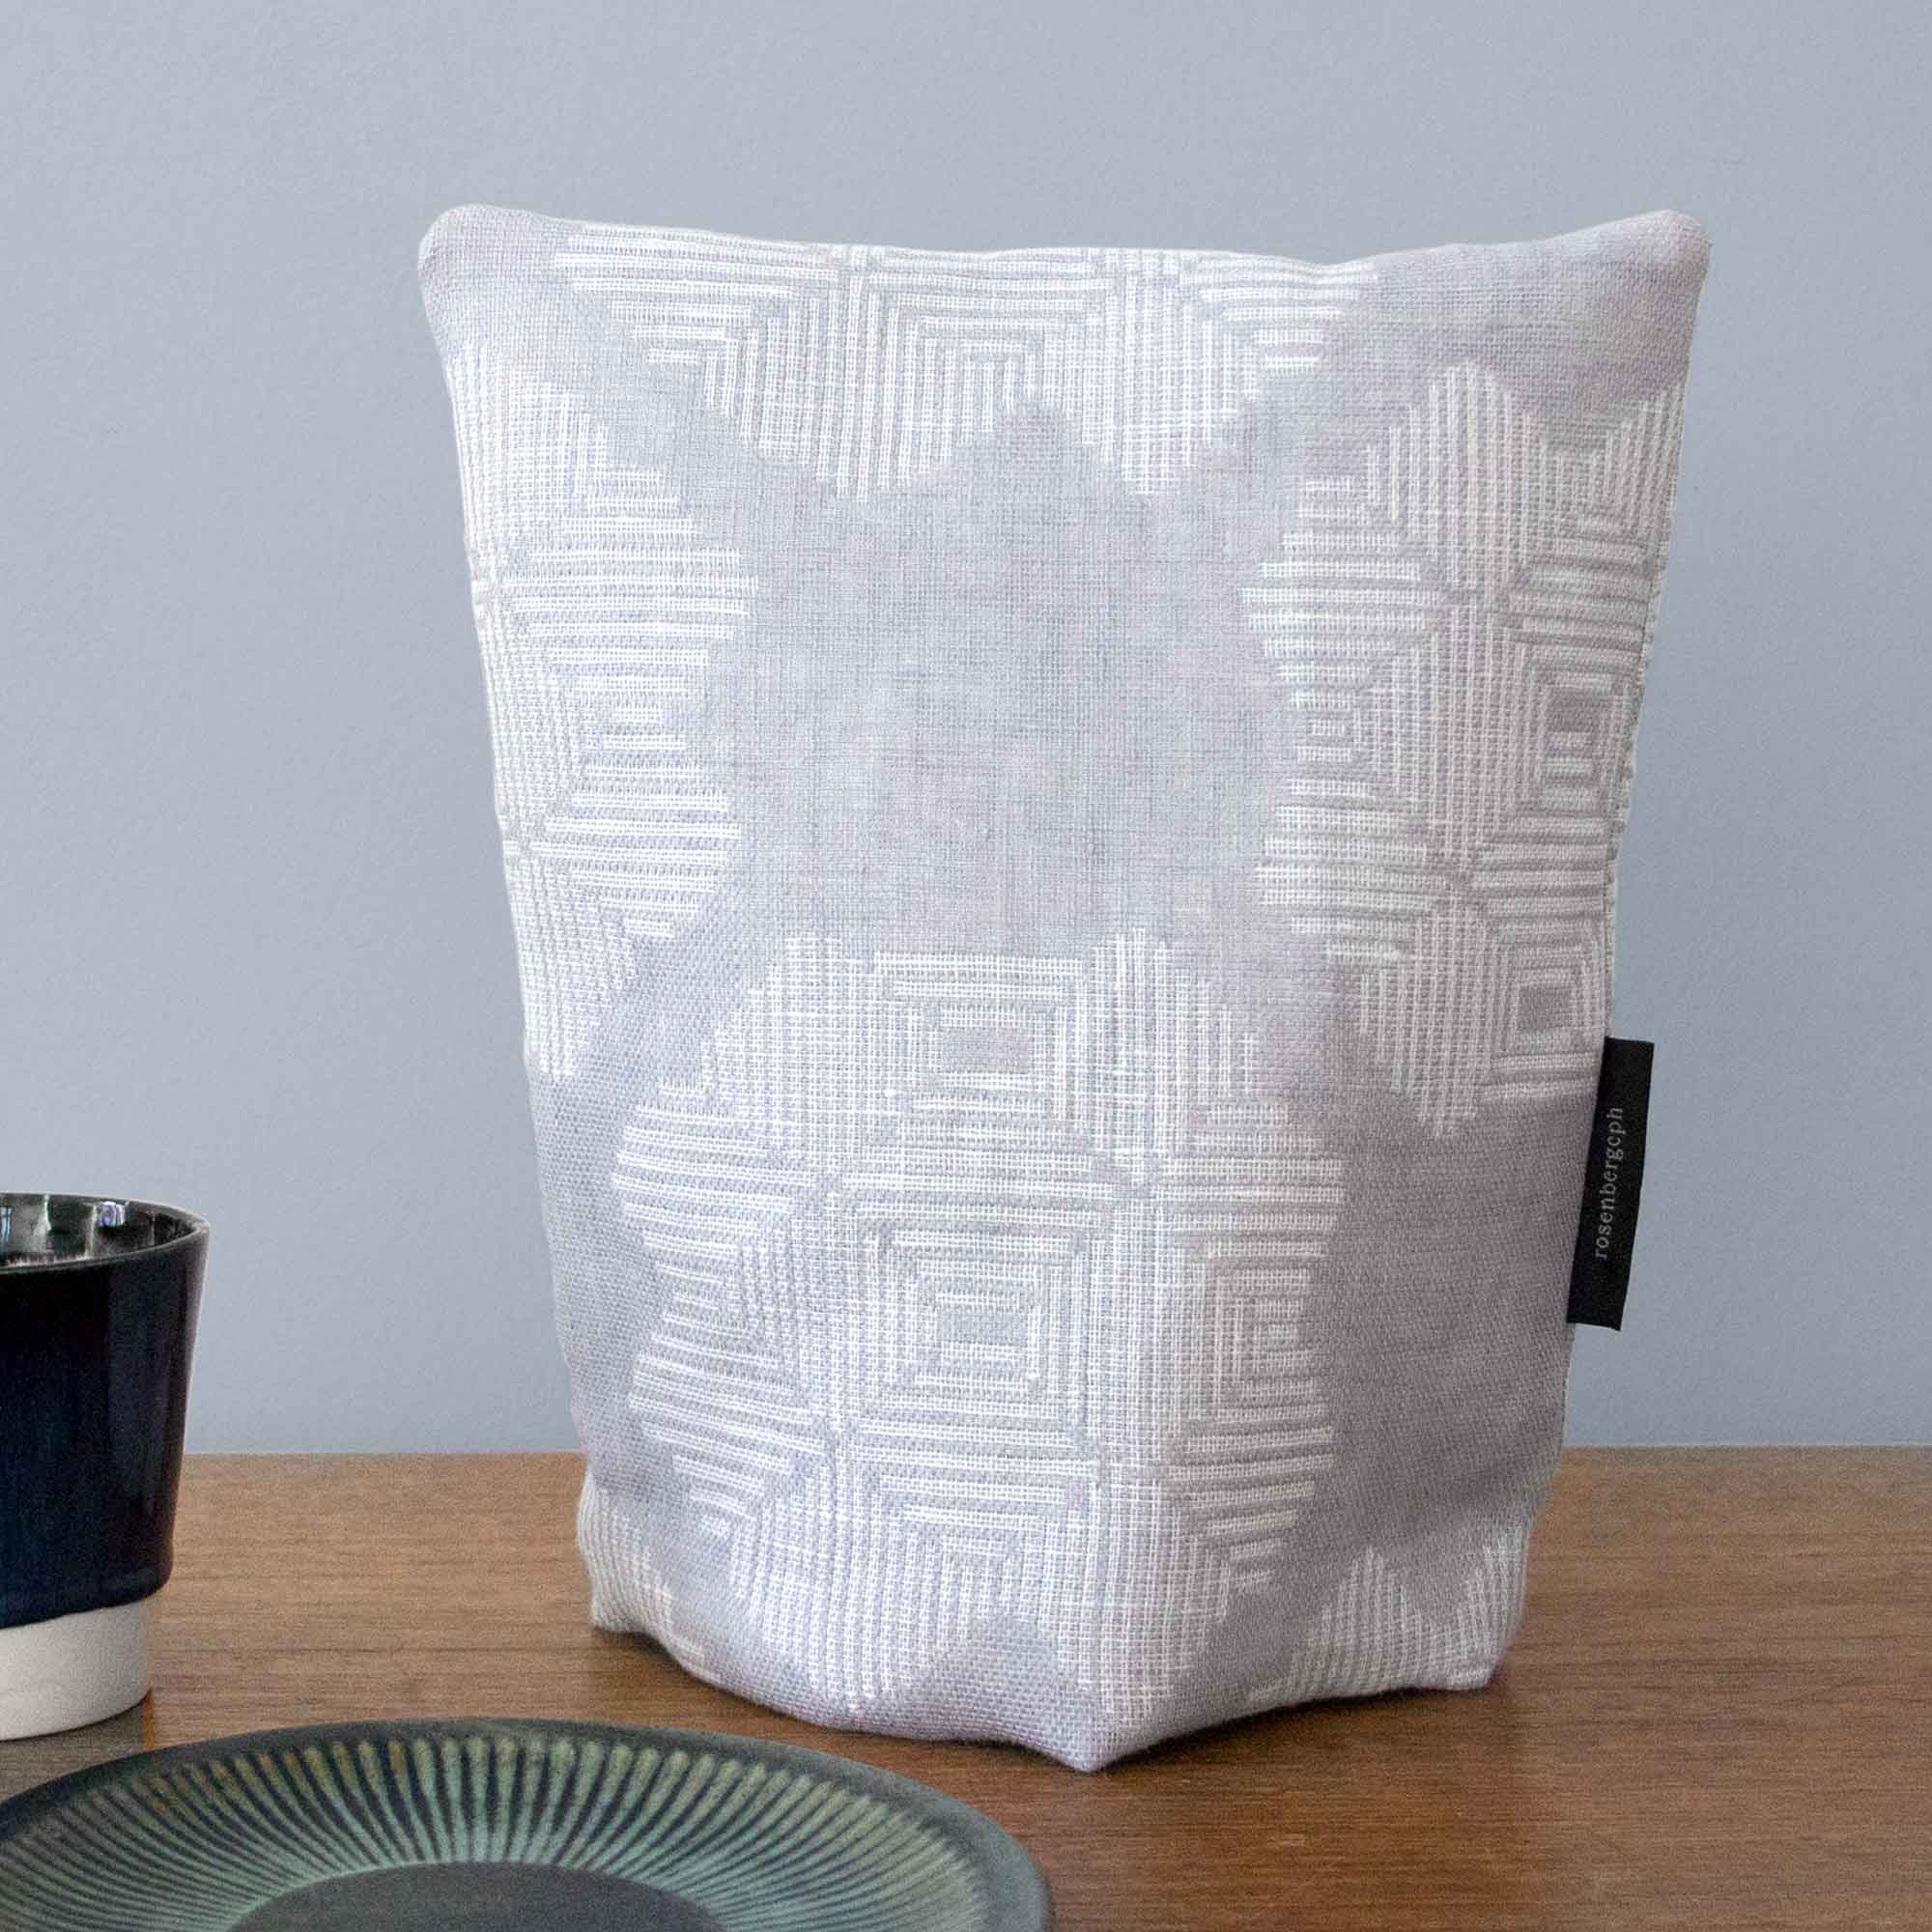 Coffee cosy, Desert rose, grey, 100% linen